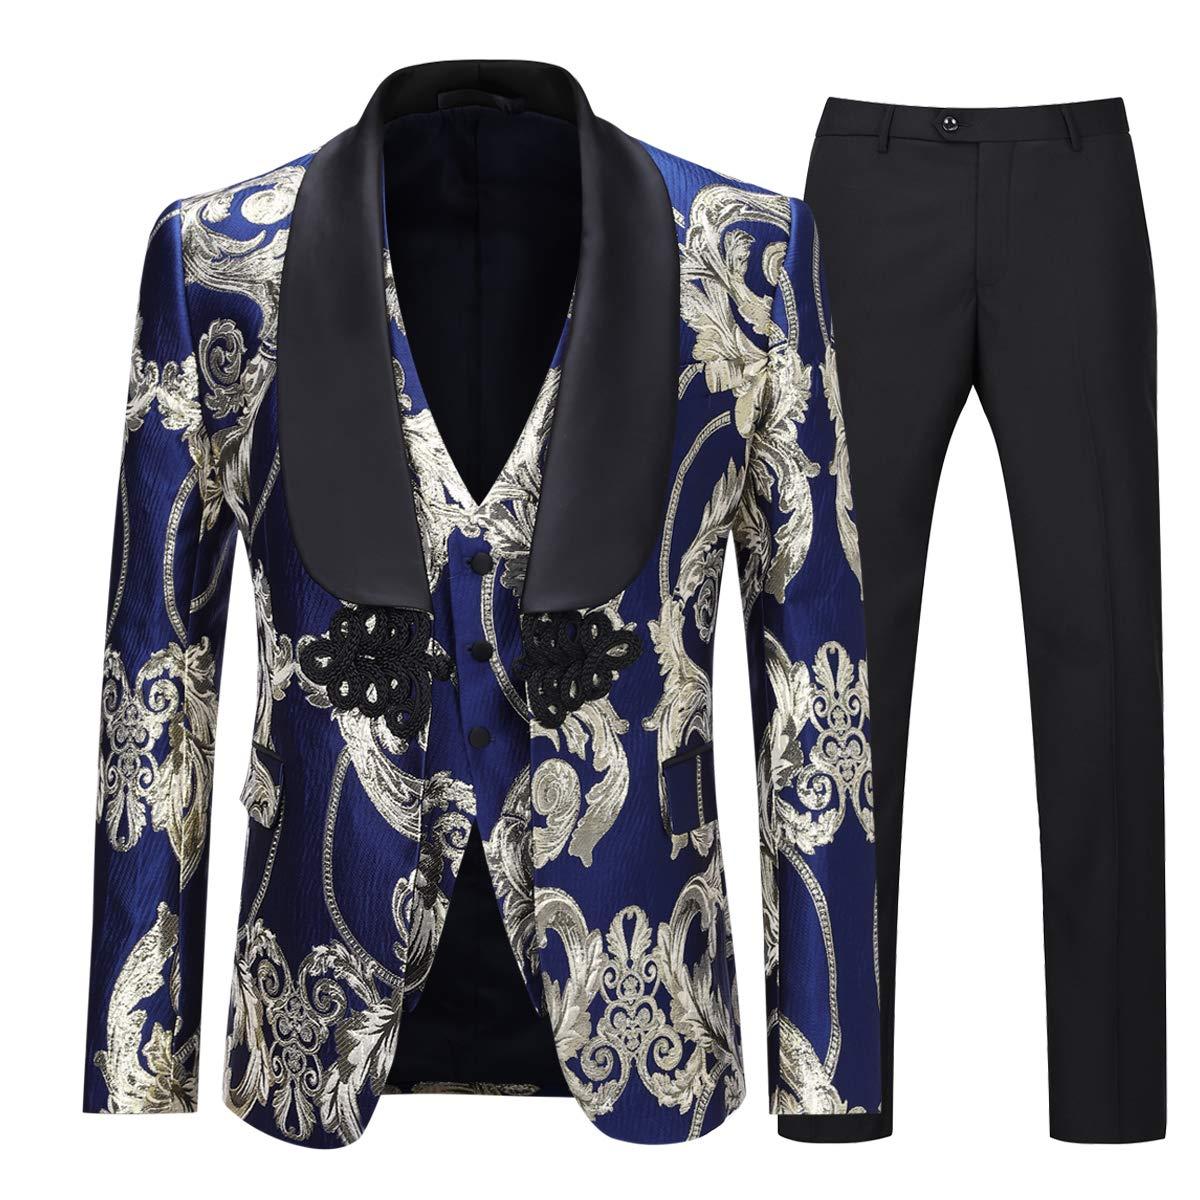 Boyland Men's Luxury Tuxedo Suit Slim Fit 3 Pieces Shawl Lapel Golden Floral Prom Dinner Formalwear Suit Jacket Vest Pants by Boyland